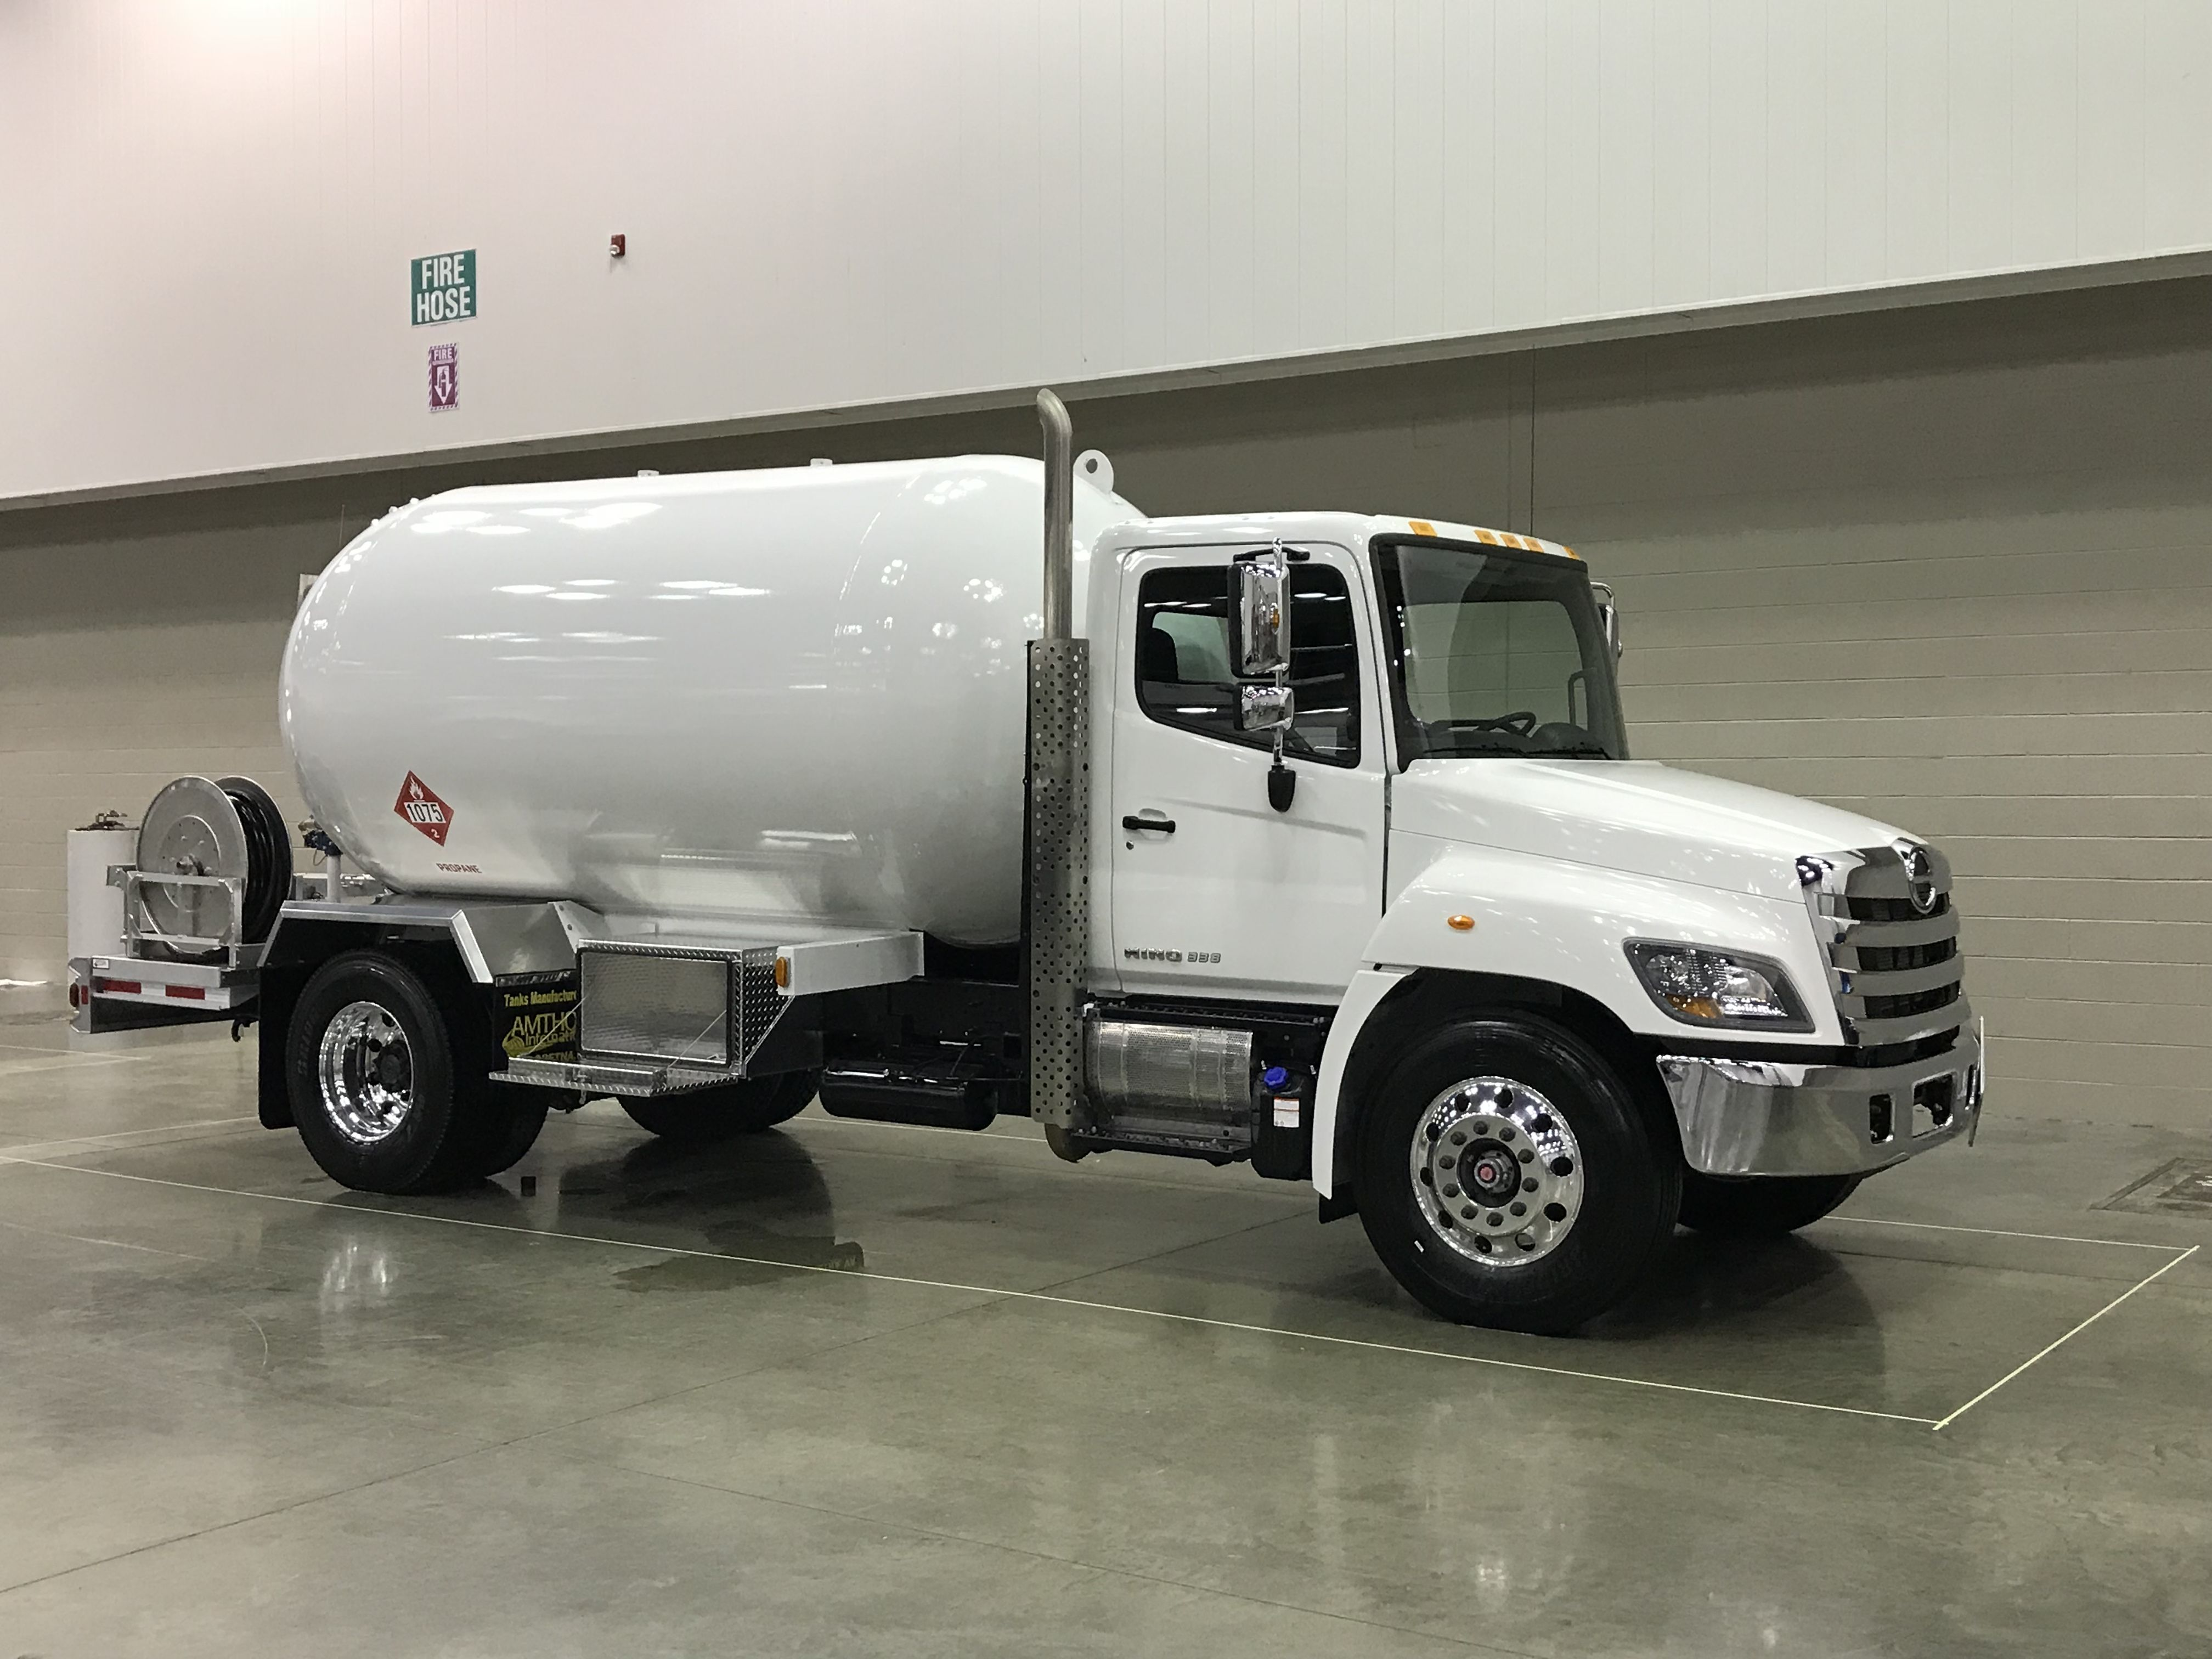 2018 Hino 338 With A 3499 Wg Propane Bobtail 18p003 Trucks Buy